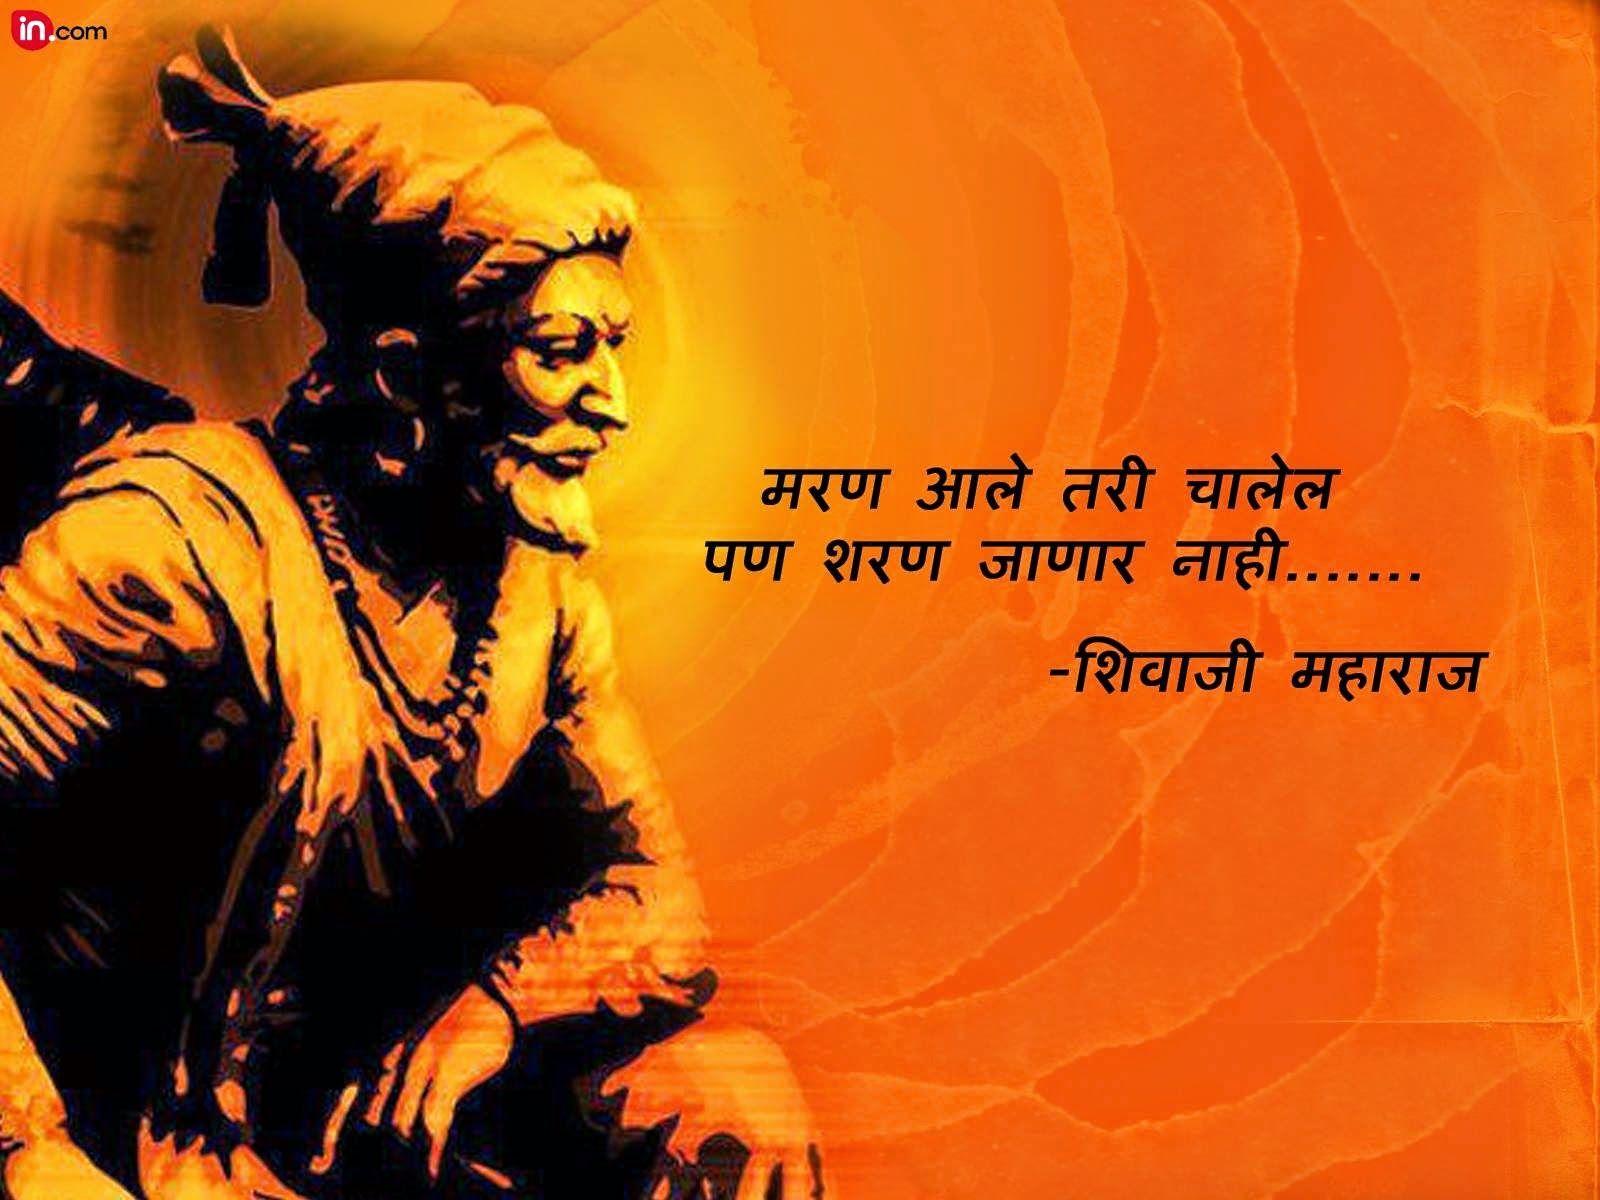 Hd wallpaper shivaji maharaj - Shivaji Maharaj Mobile Wallpaper Free Download